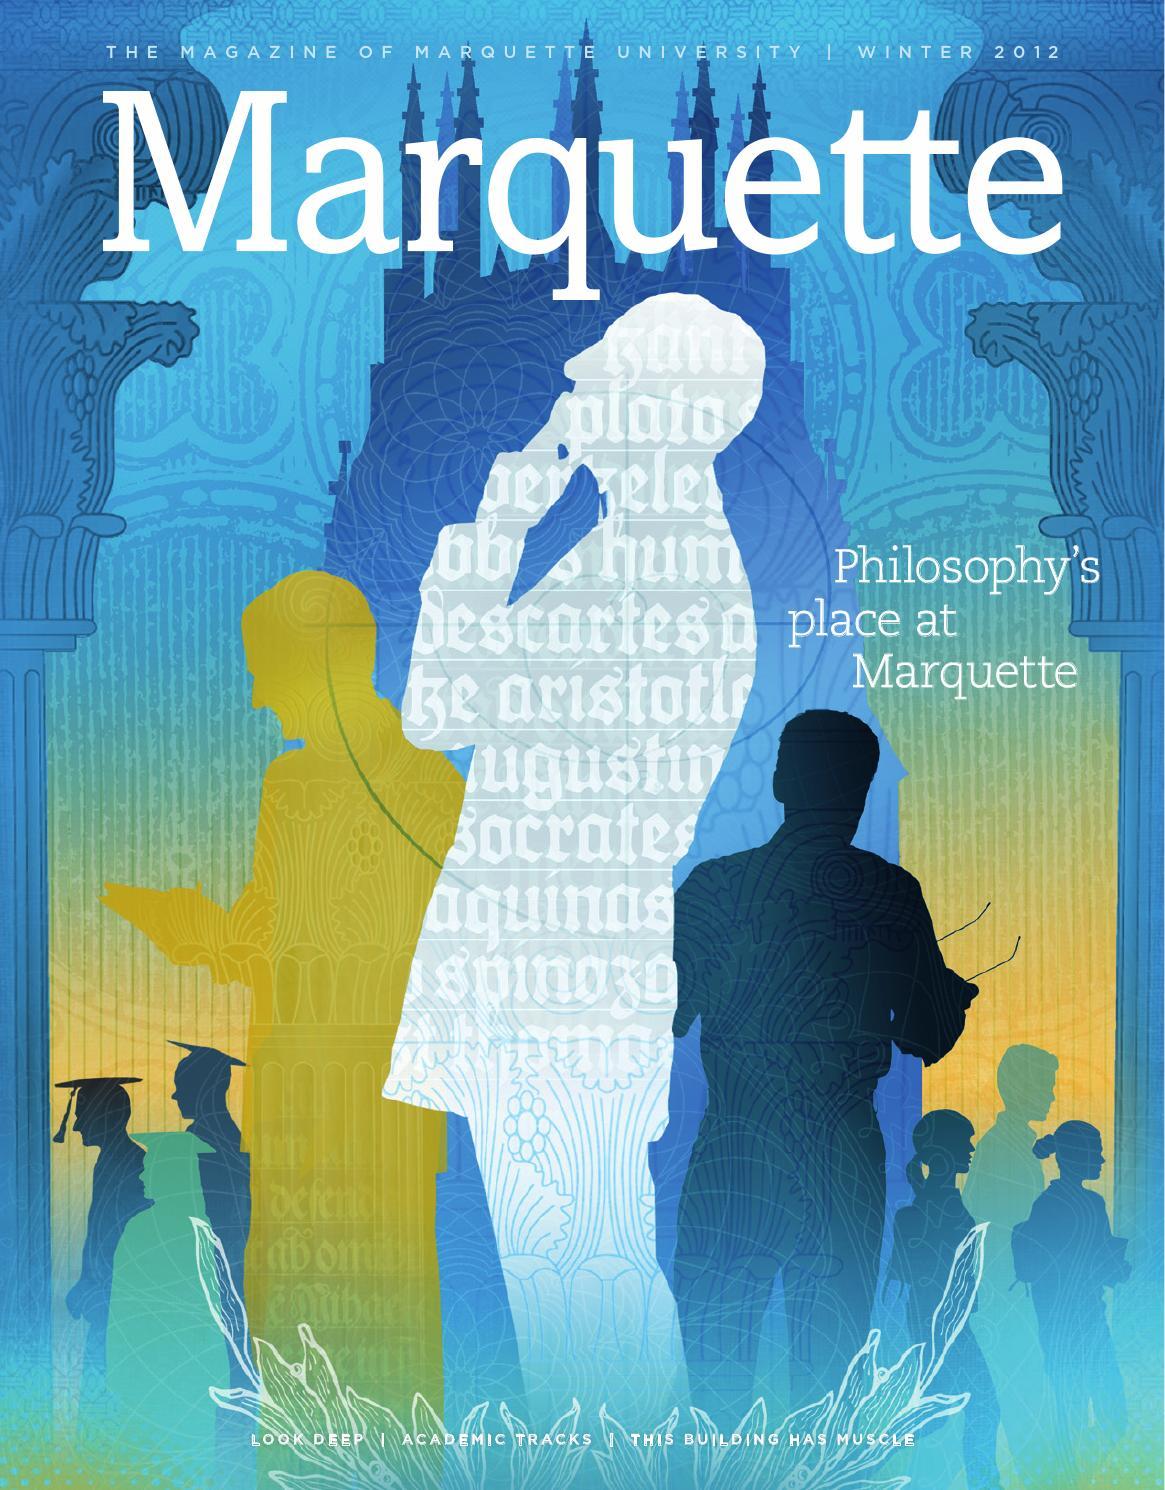 c7b6494f1a93 Marquette Magazine Winter 2012 by Marquette University - issuu